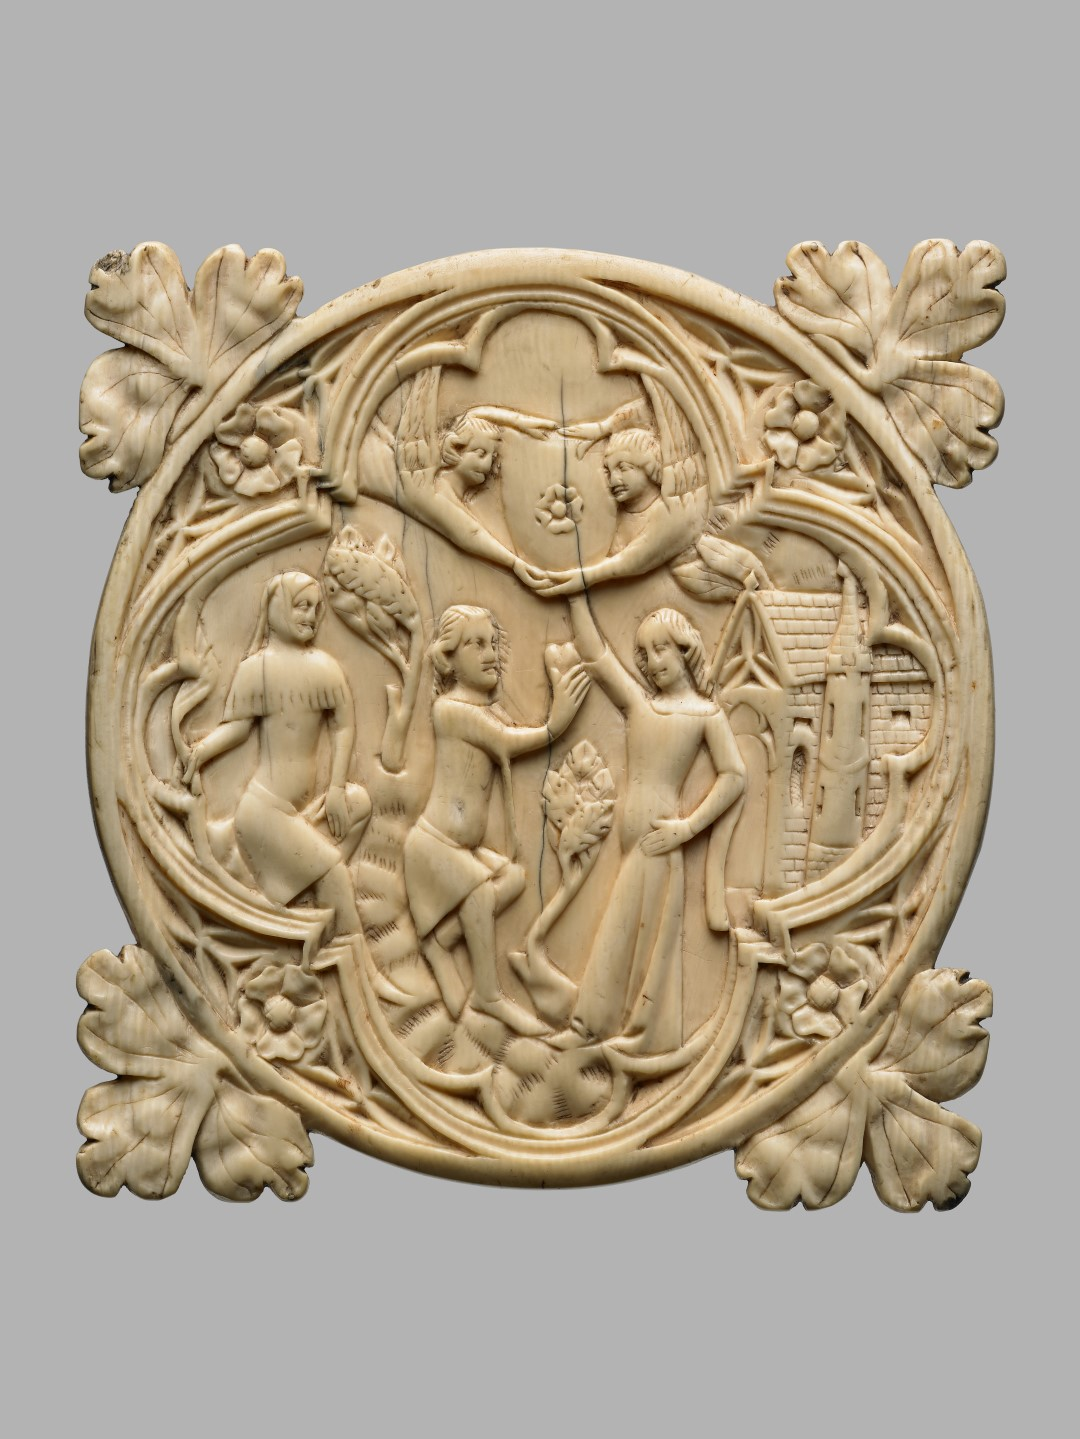 Estuche para espejo 1370-1400 Francia